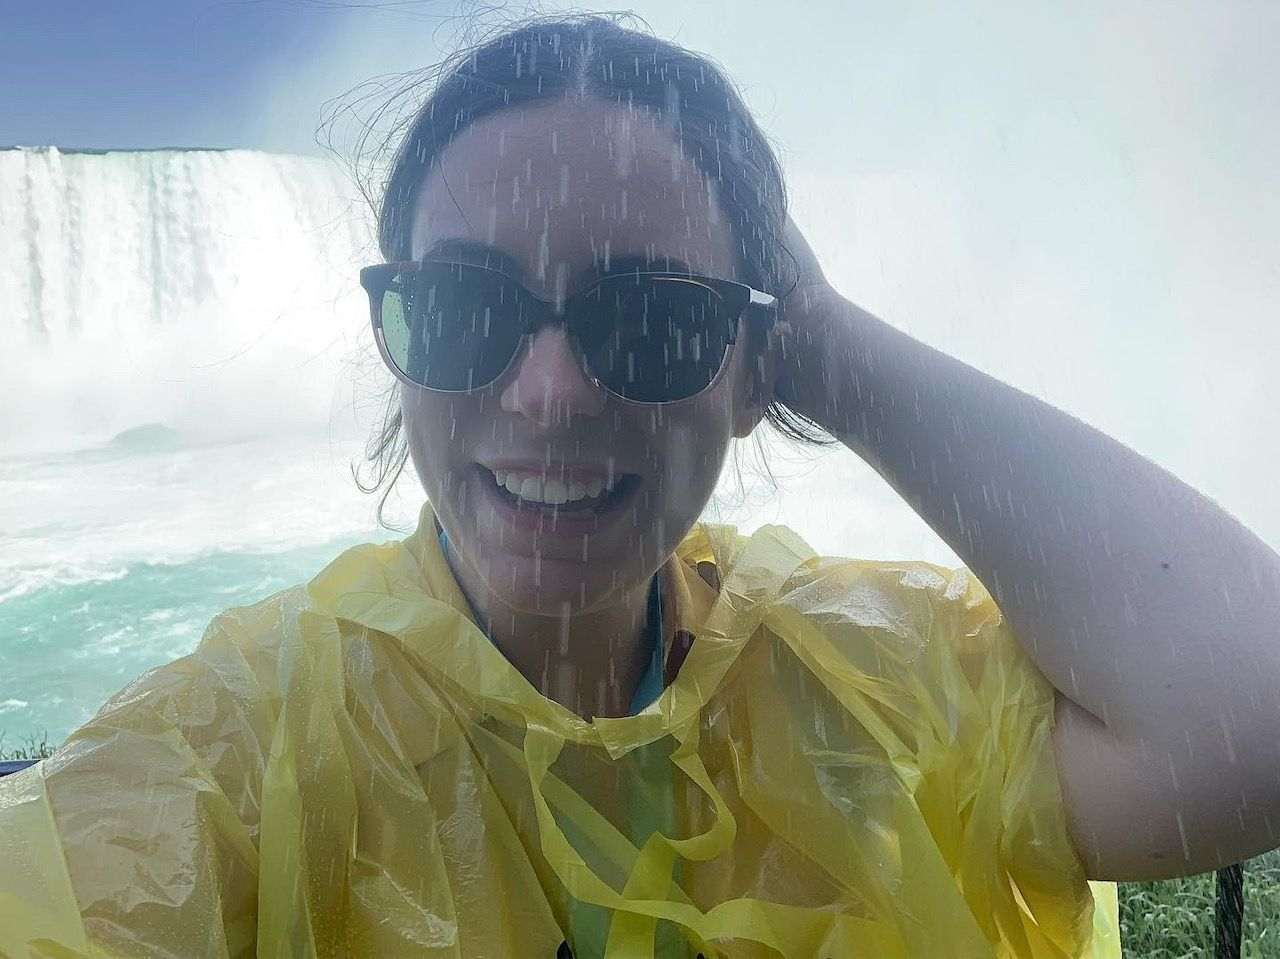 niagra falls, laura reilly